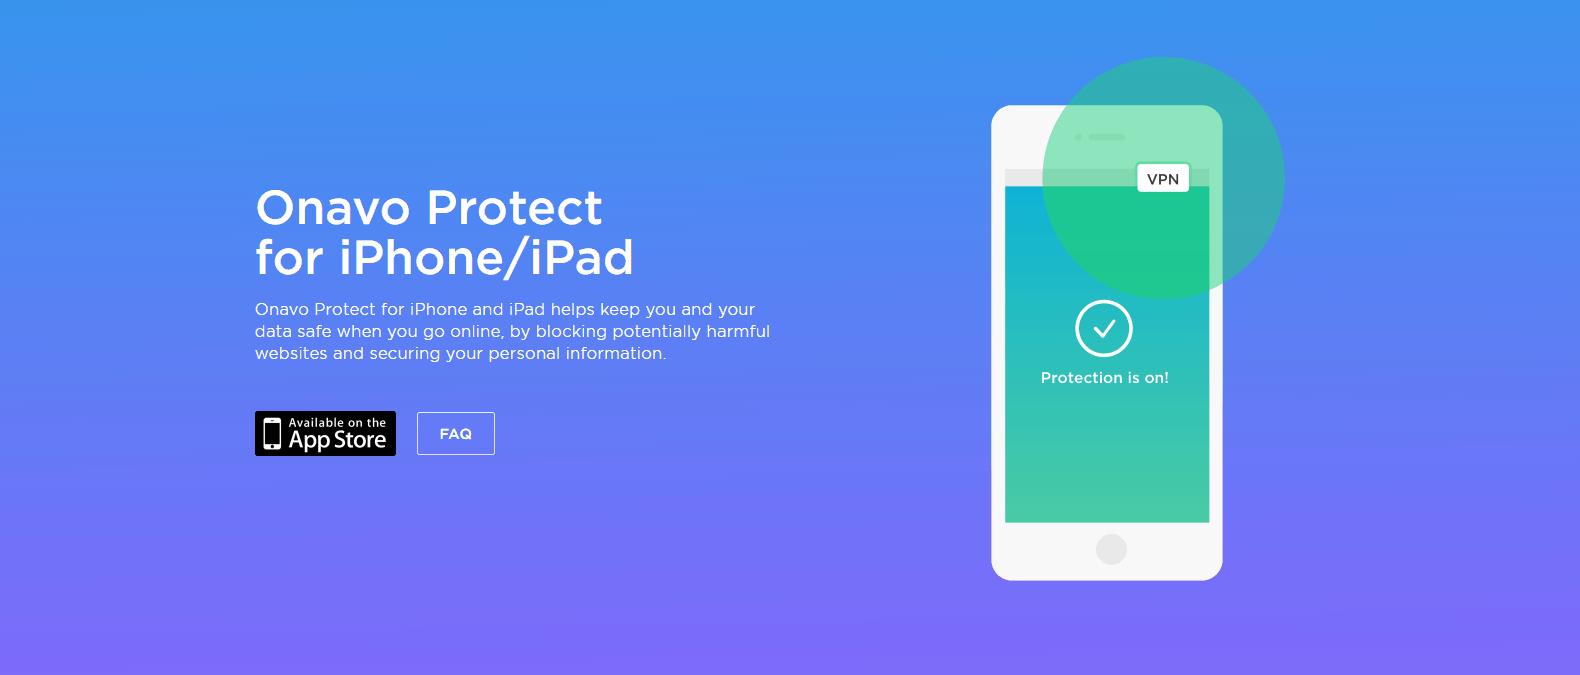 Facebook Onavo Protect iOS